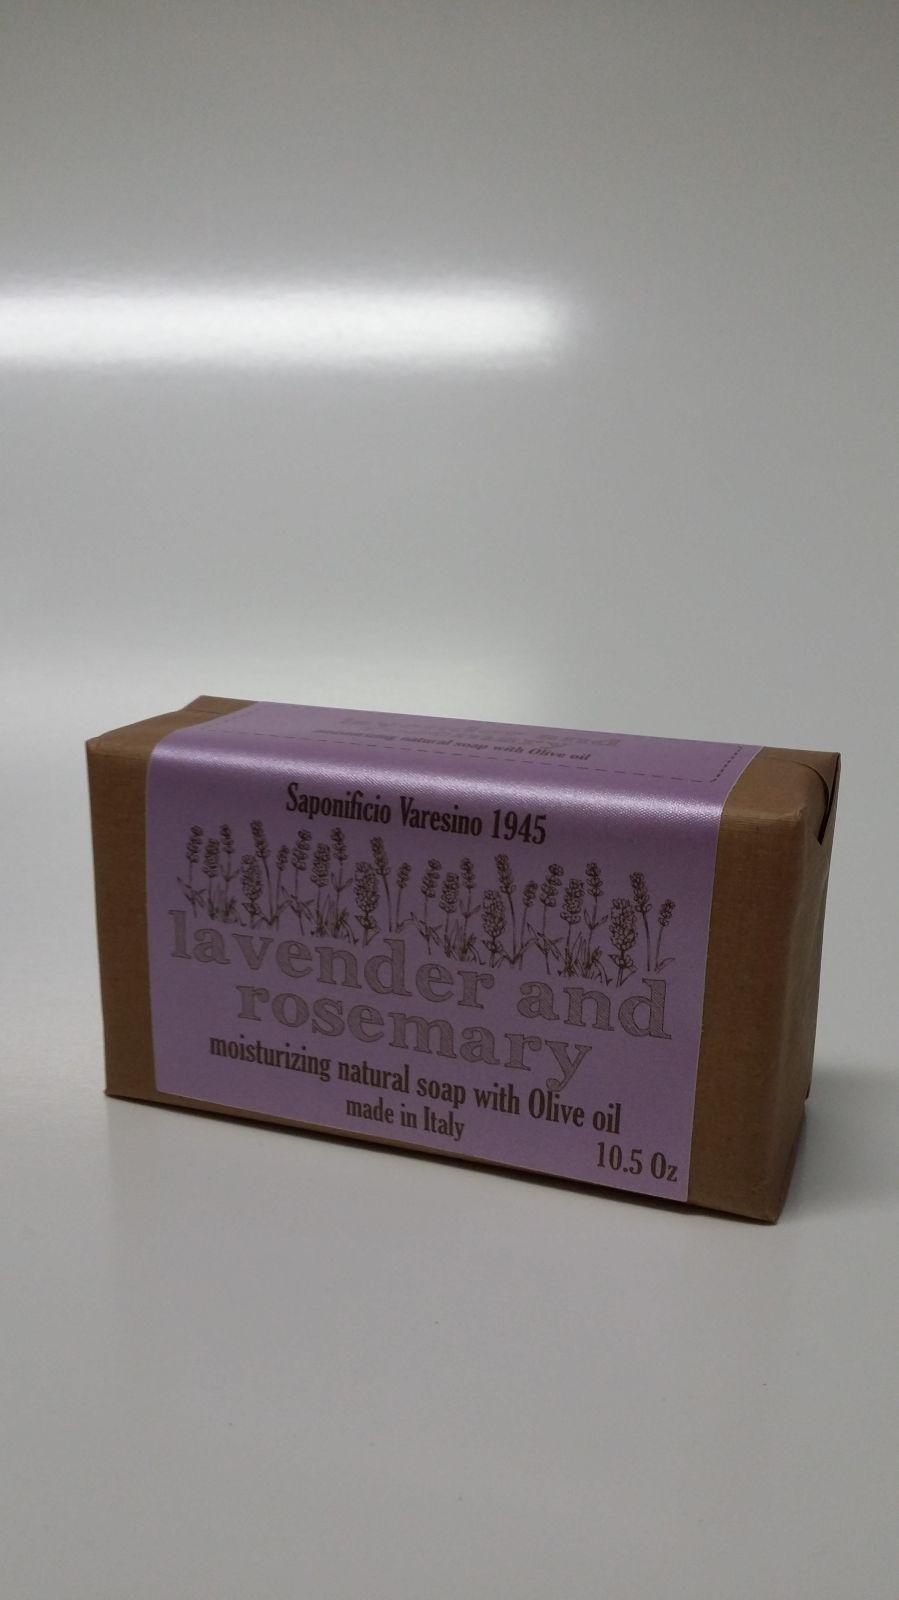 Saponificio Varesino - Levanda e Rosemary soap 300 g